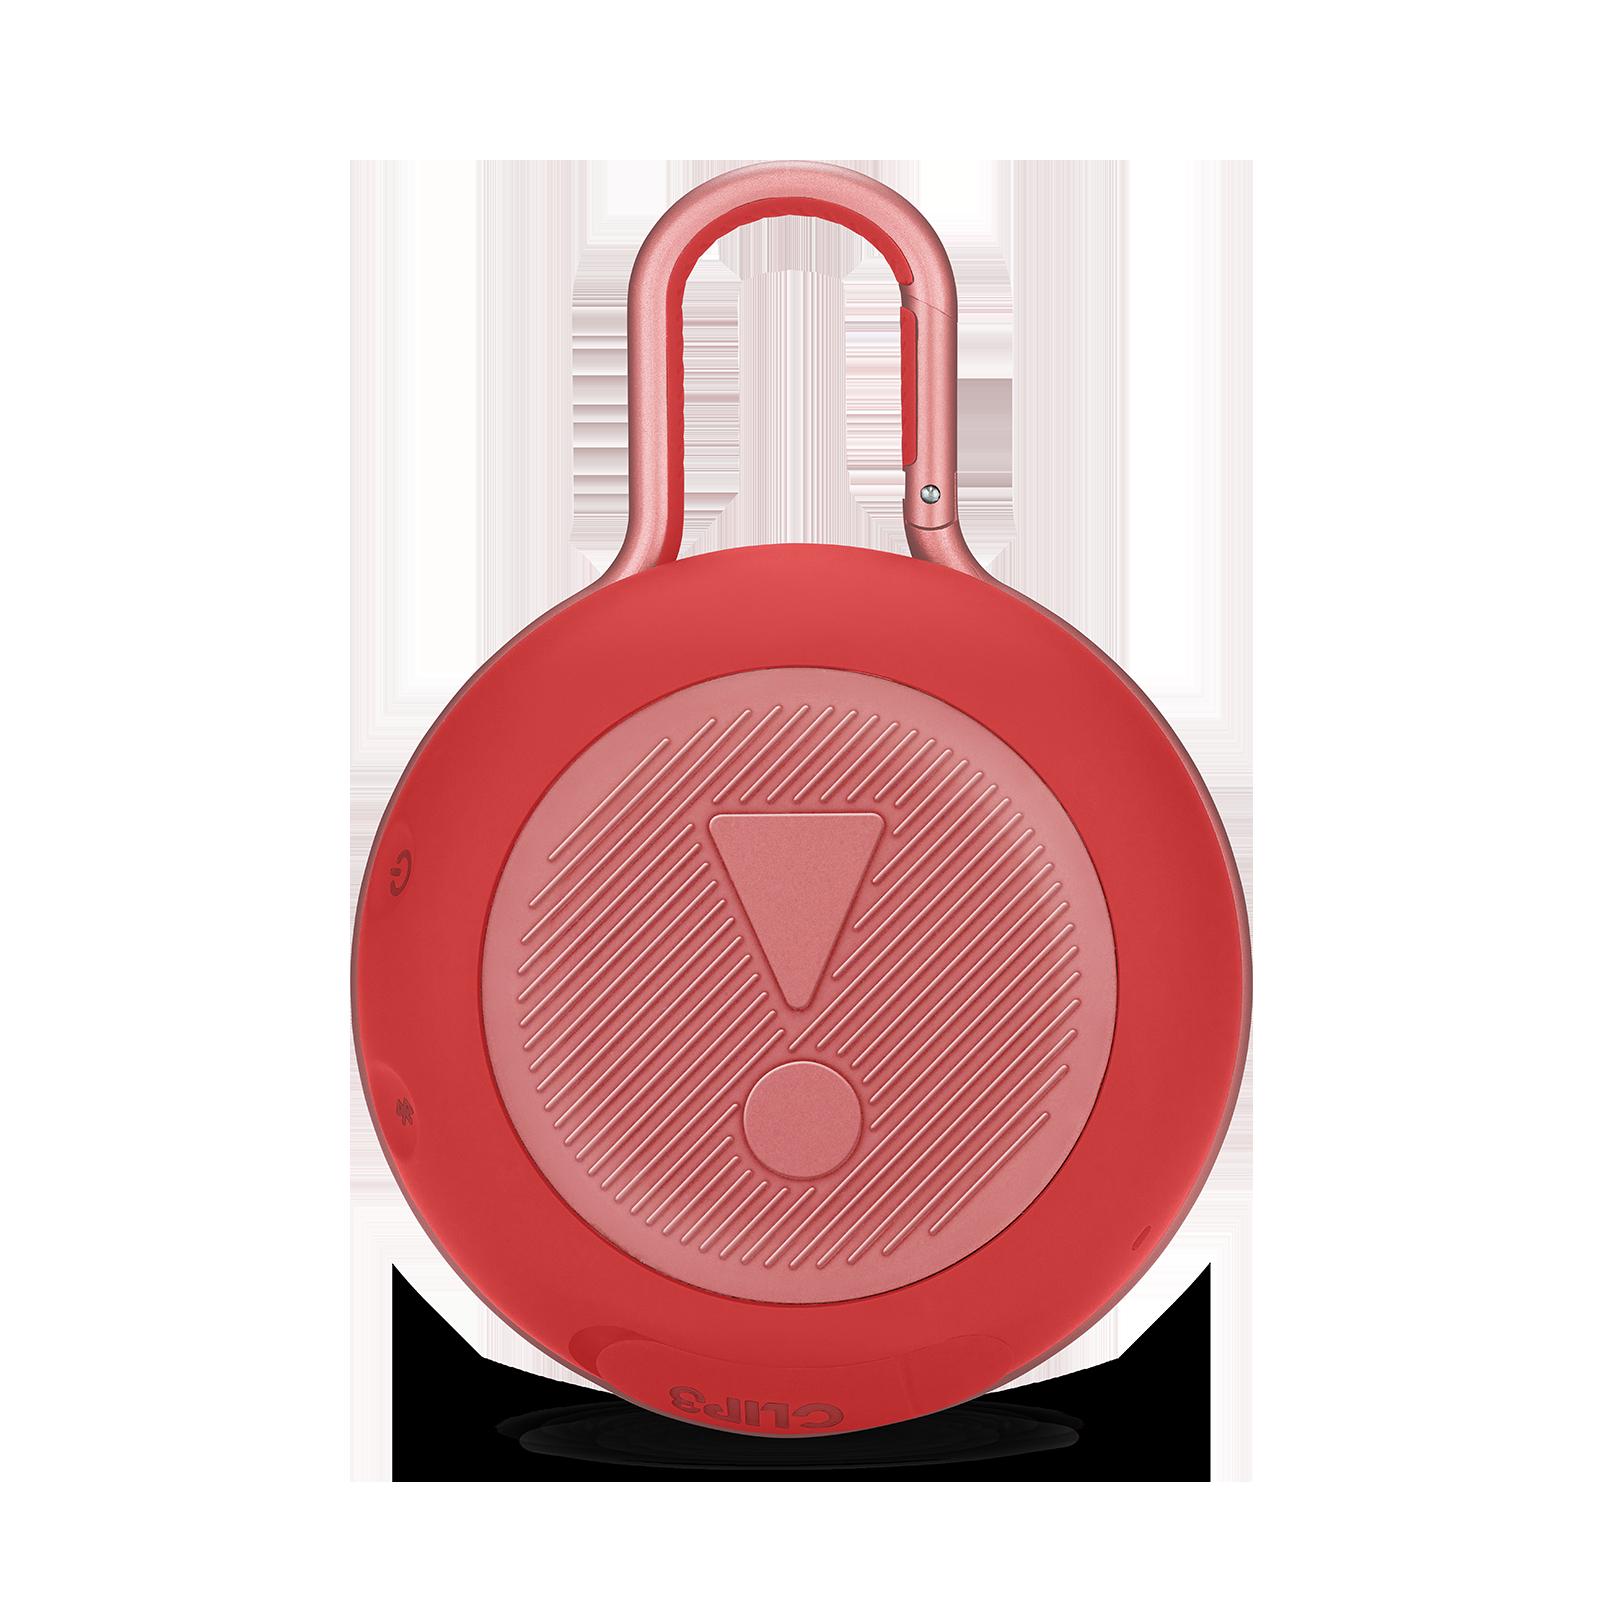 JBL CLIP 3 - Fiesta Red - Portable Bluetooth® speaker - Back